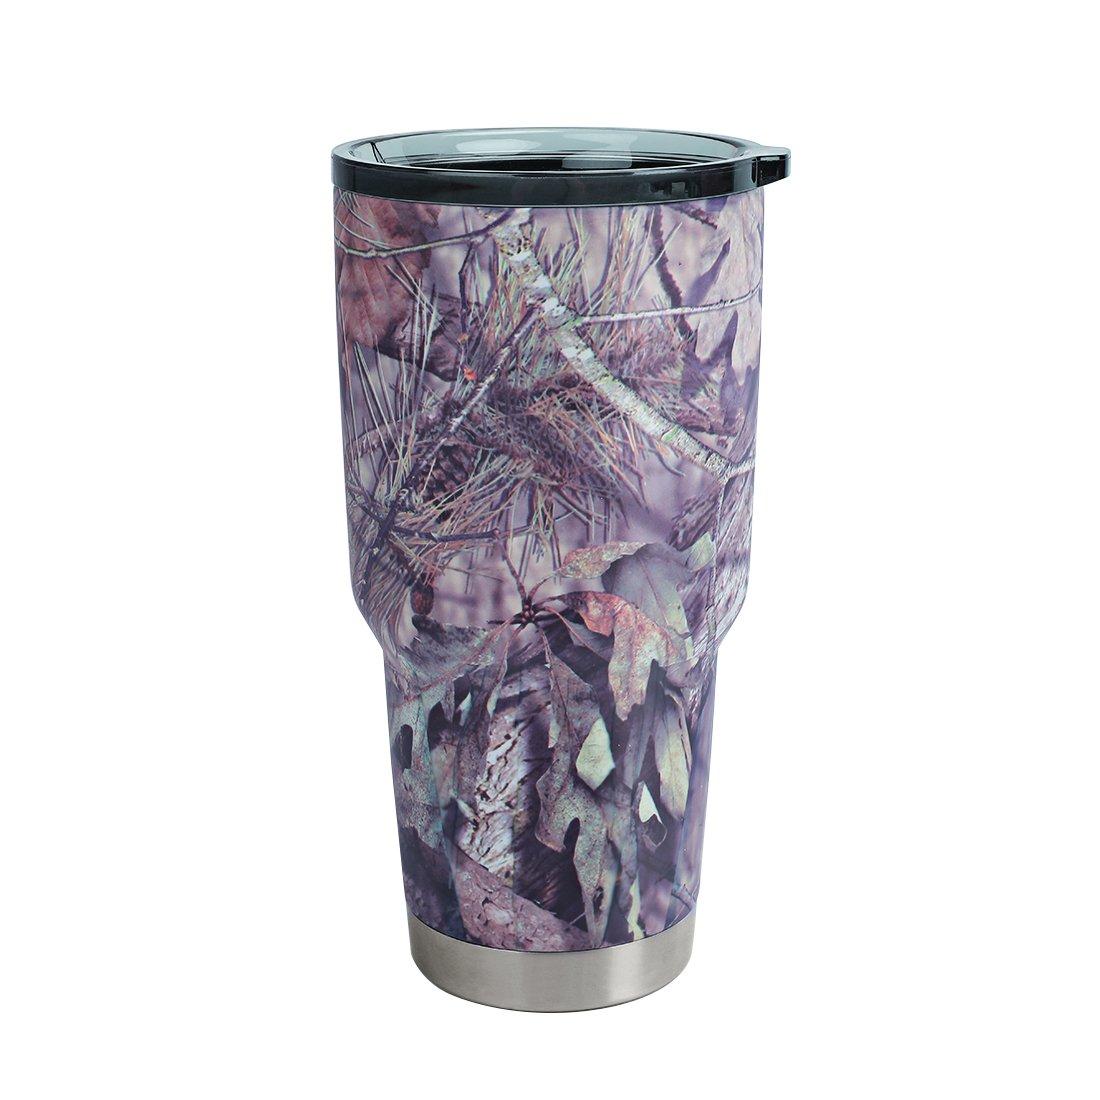 Mossy Oak Camo Tumbler, Stainless Steel Vacuum Insulated Cups, Coffee Travel Mug, 30 oz